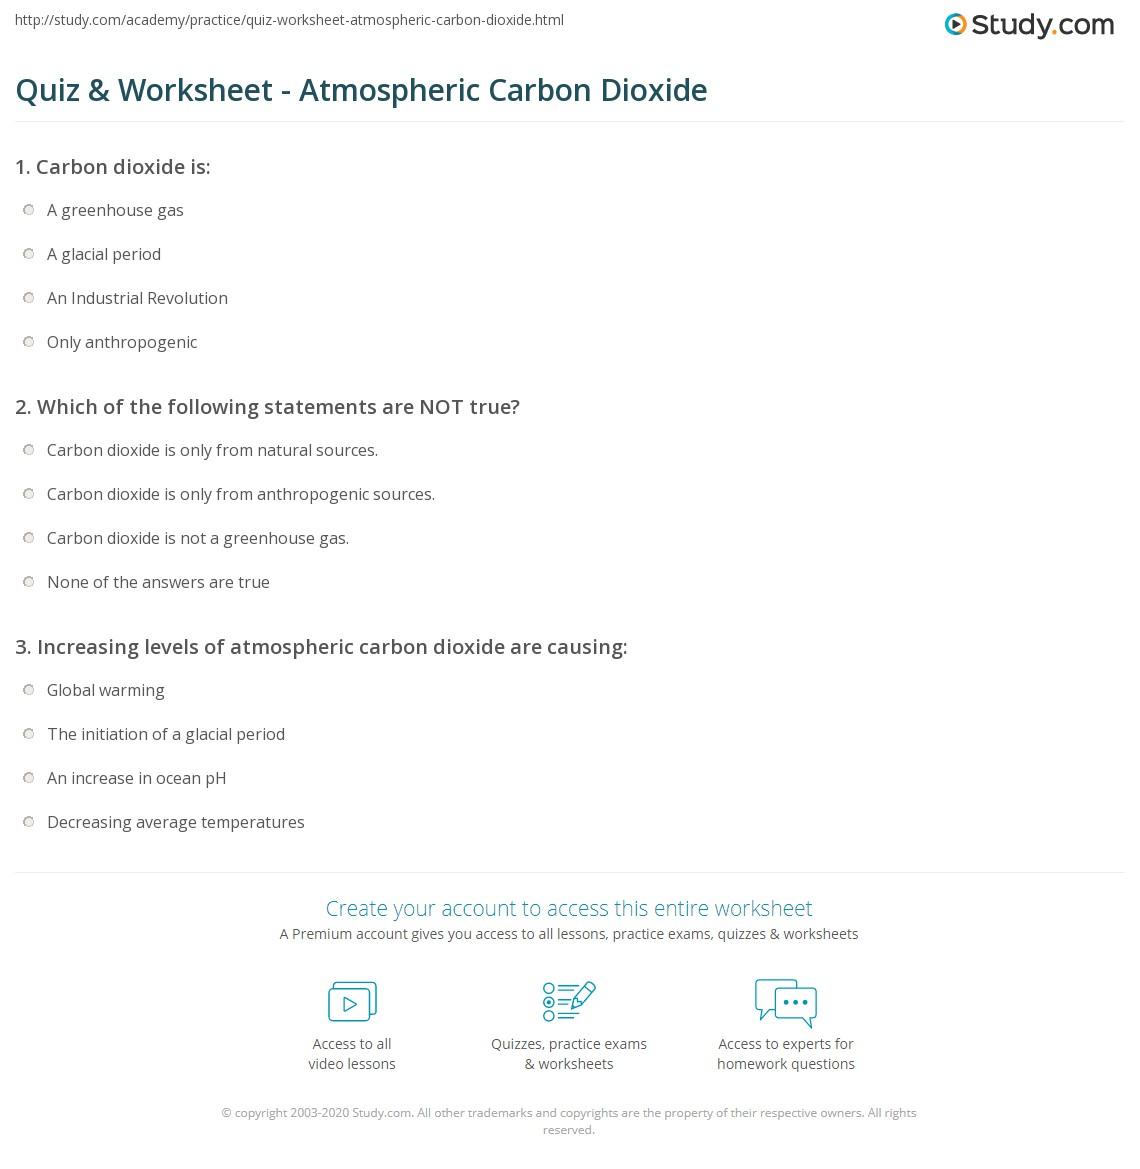 Quiz worksheet atmospheric carbon dioxide study print atmospheric carbon dioxide history environmental effects worksheet gamestrikefo Image collections